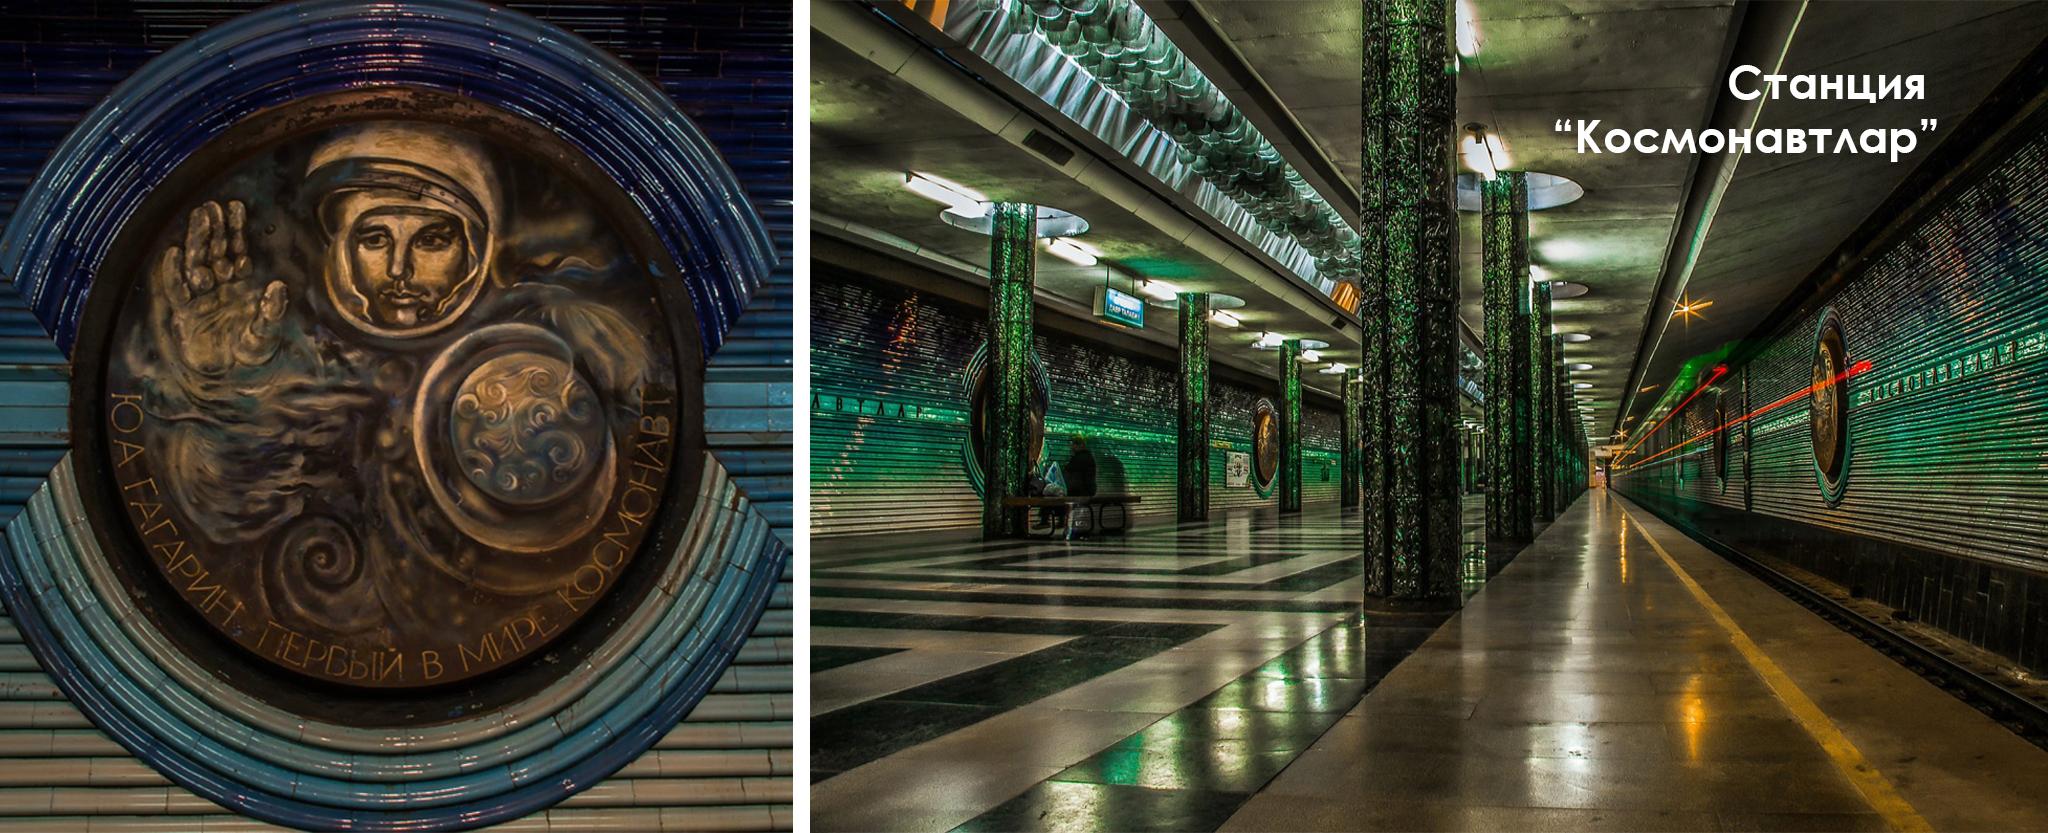 Ташкент, метро, станция Космонавтов.